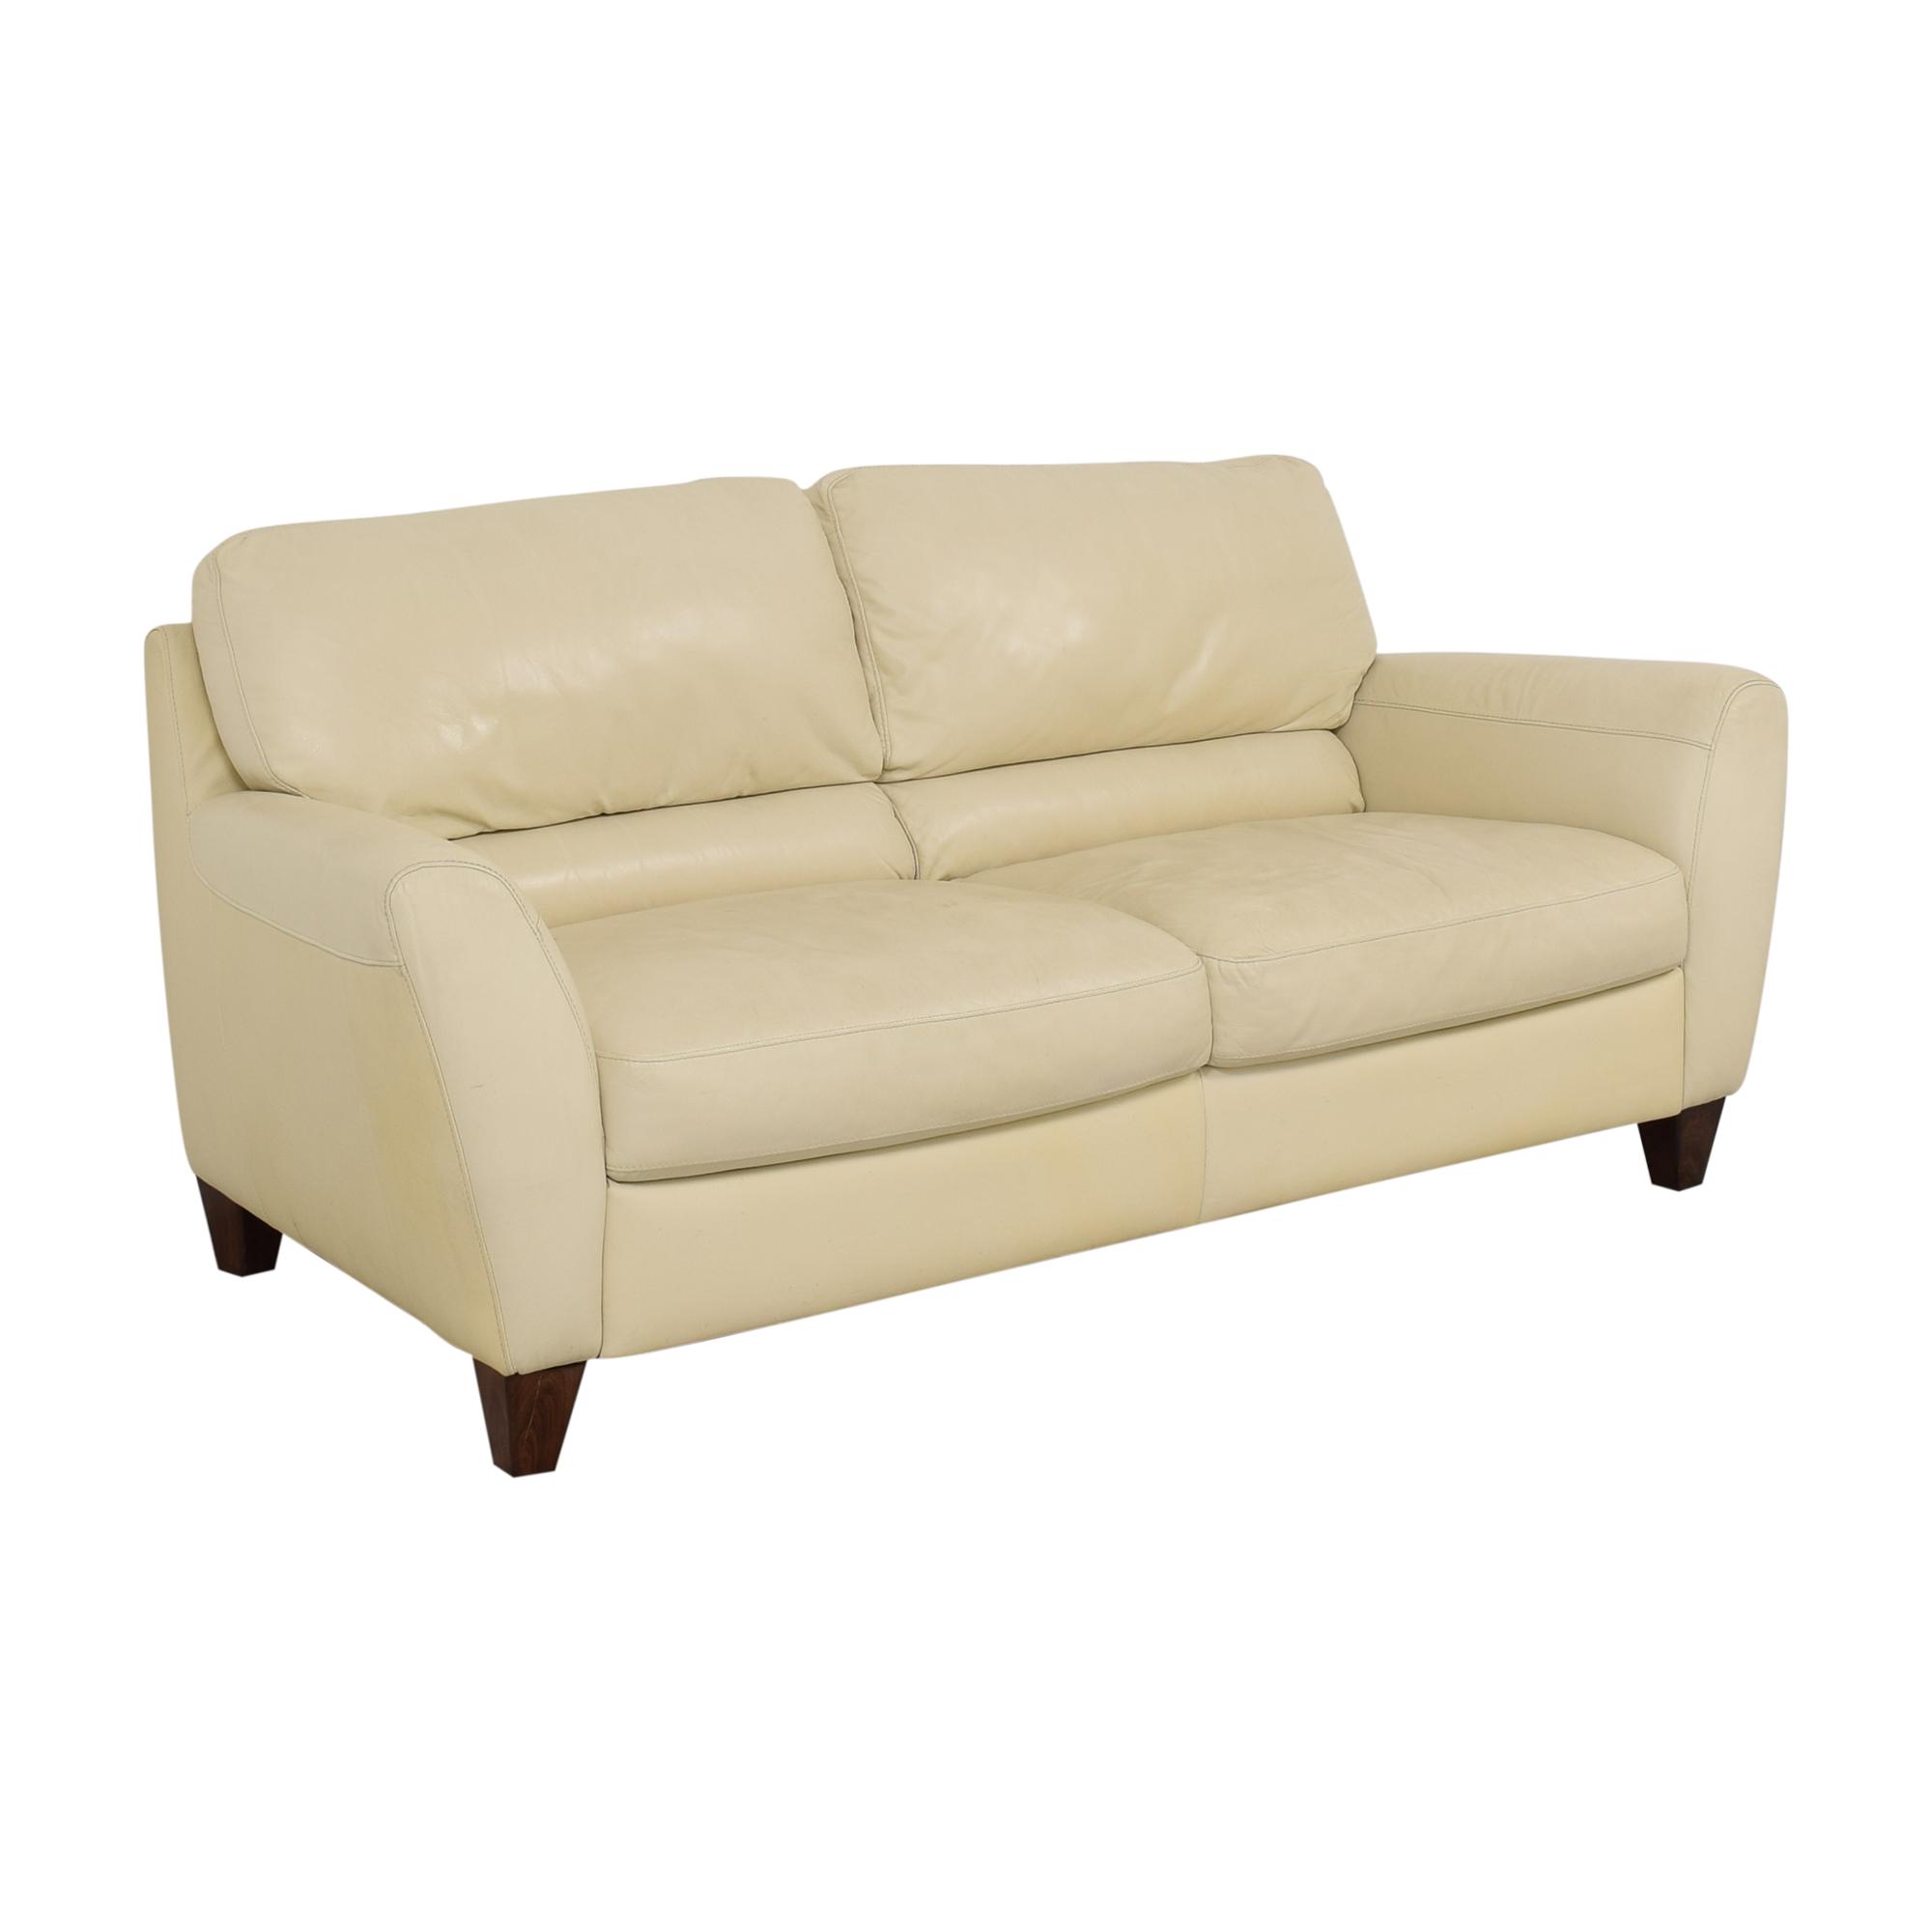 Macy's Italsofa Two Cushion Sofa sale